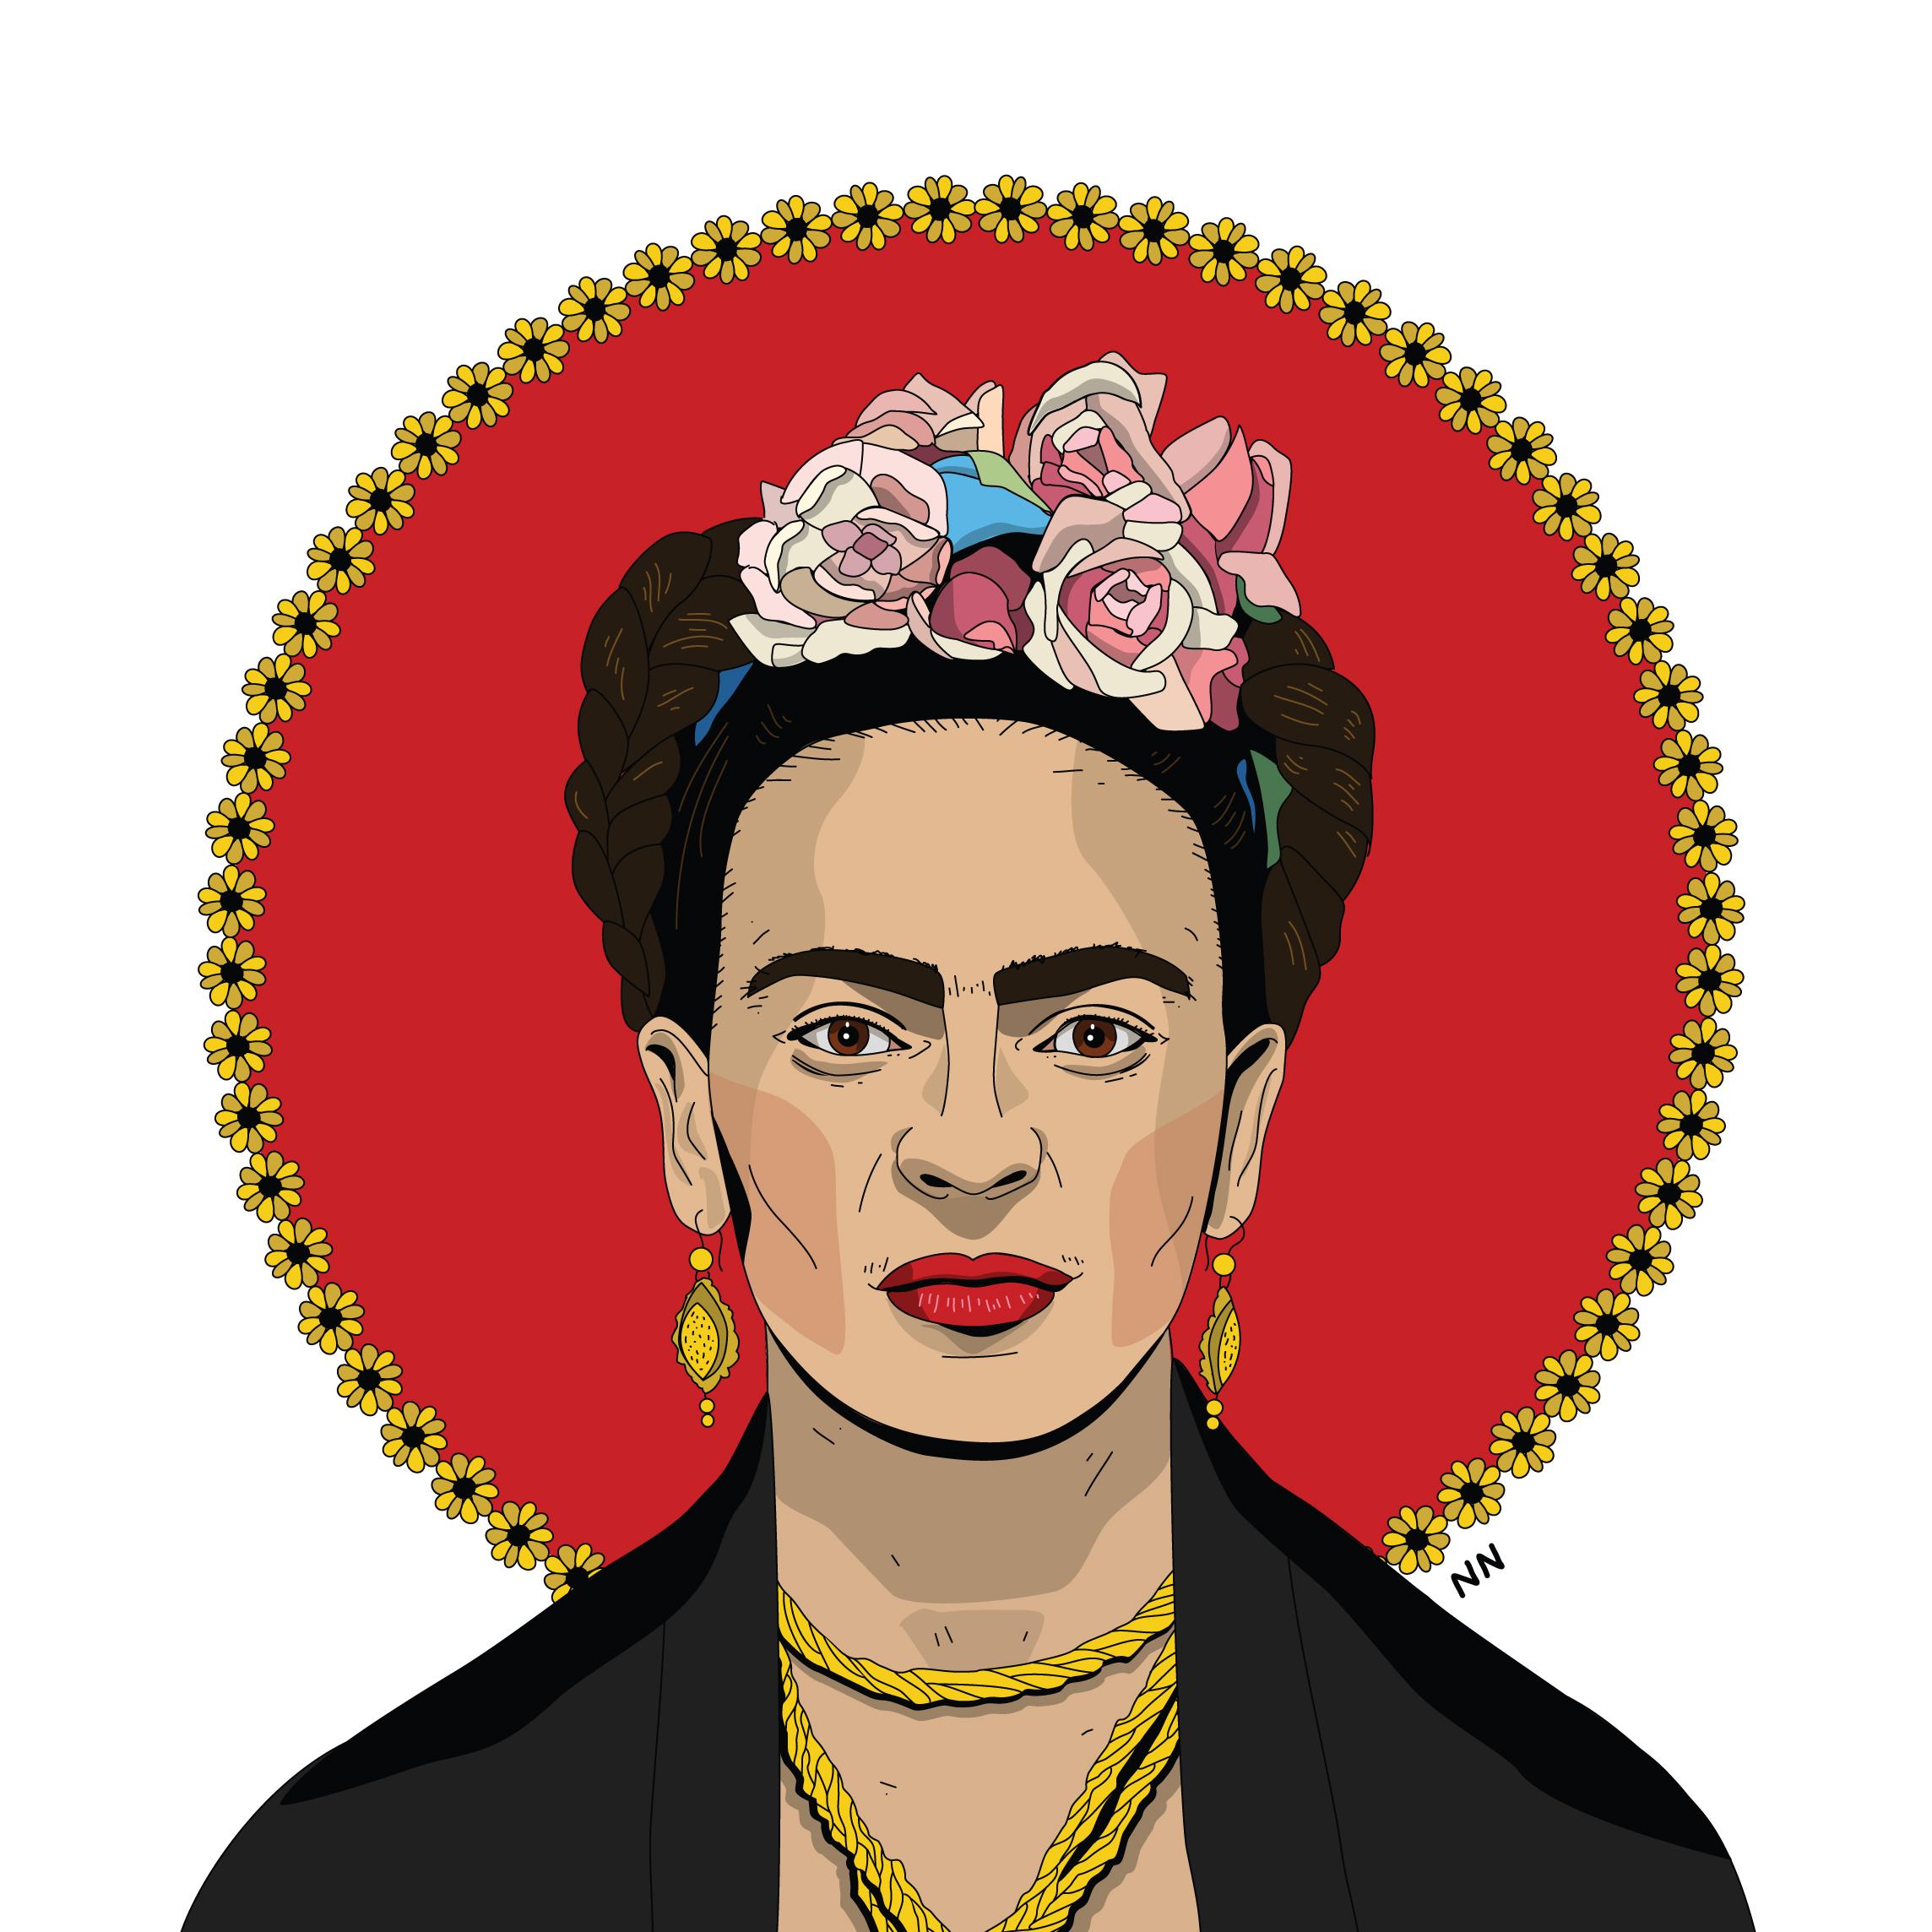 Frida_nonchangedcolors-01.jpg